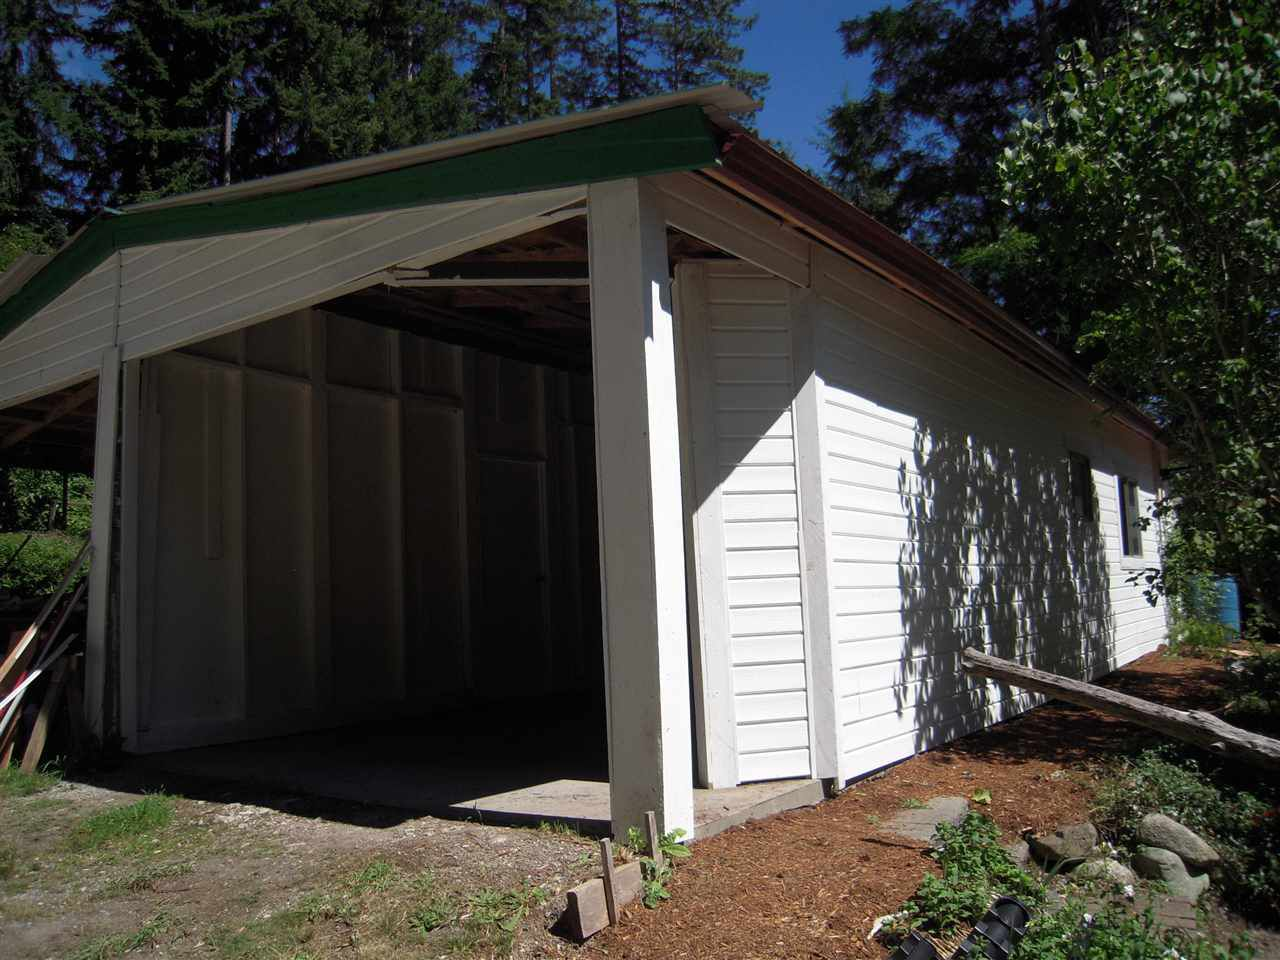 Photo 5: Photos: 2670 LOWER Road: Roberts Creek House for sale (Sunshine Coast)  : MLS®# R2096275